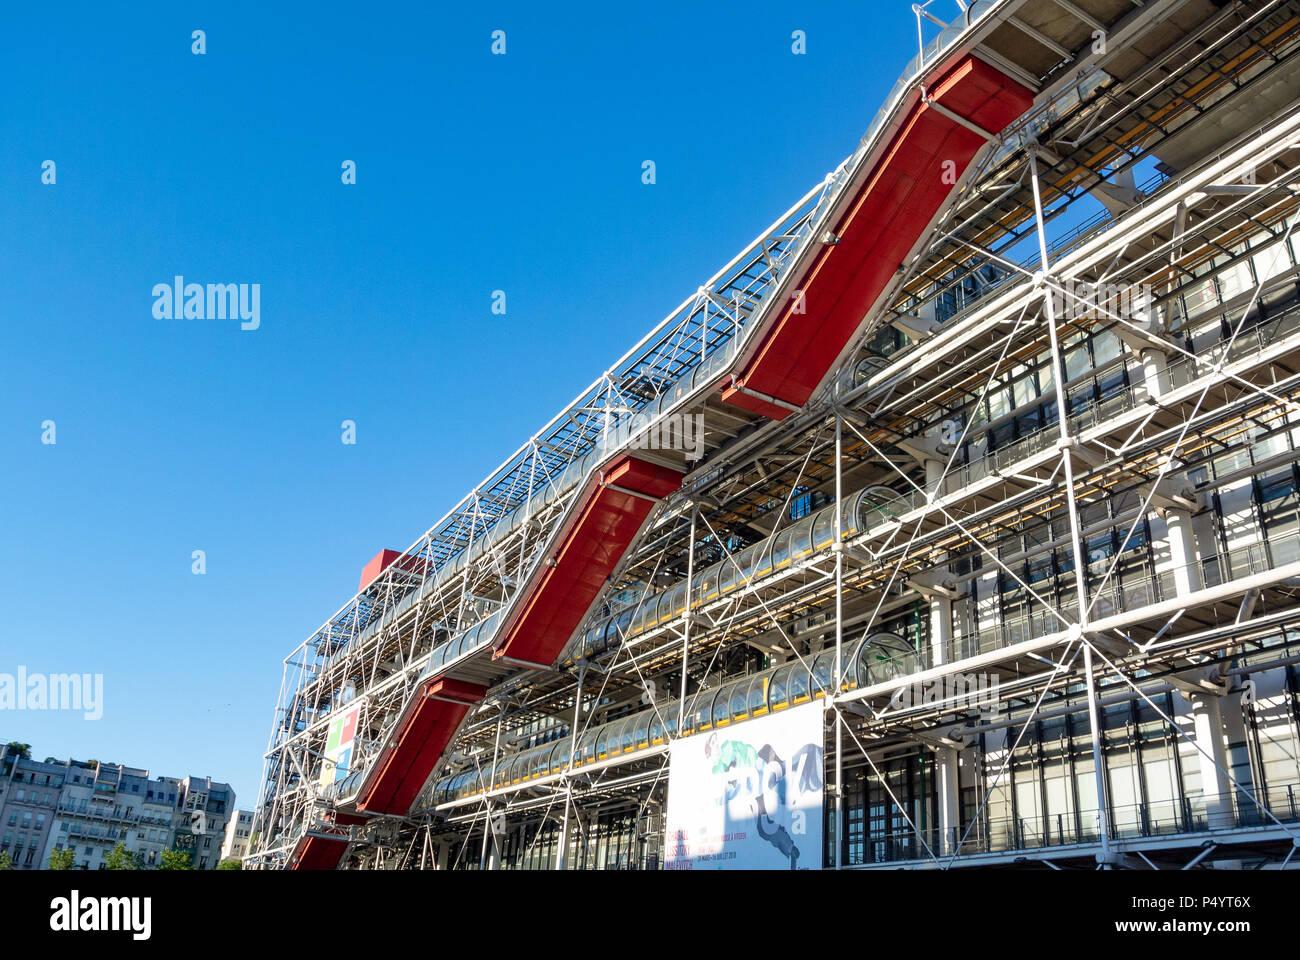 Centre Georges Pompidou auch als Centre Pompidou, Beaubourg Viertel, 4. Arrondissement, Paris, IDF, Frankreich bekannt Stockbild